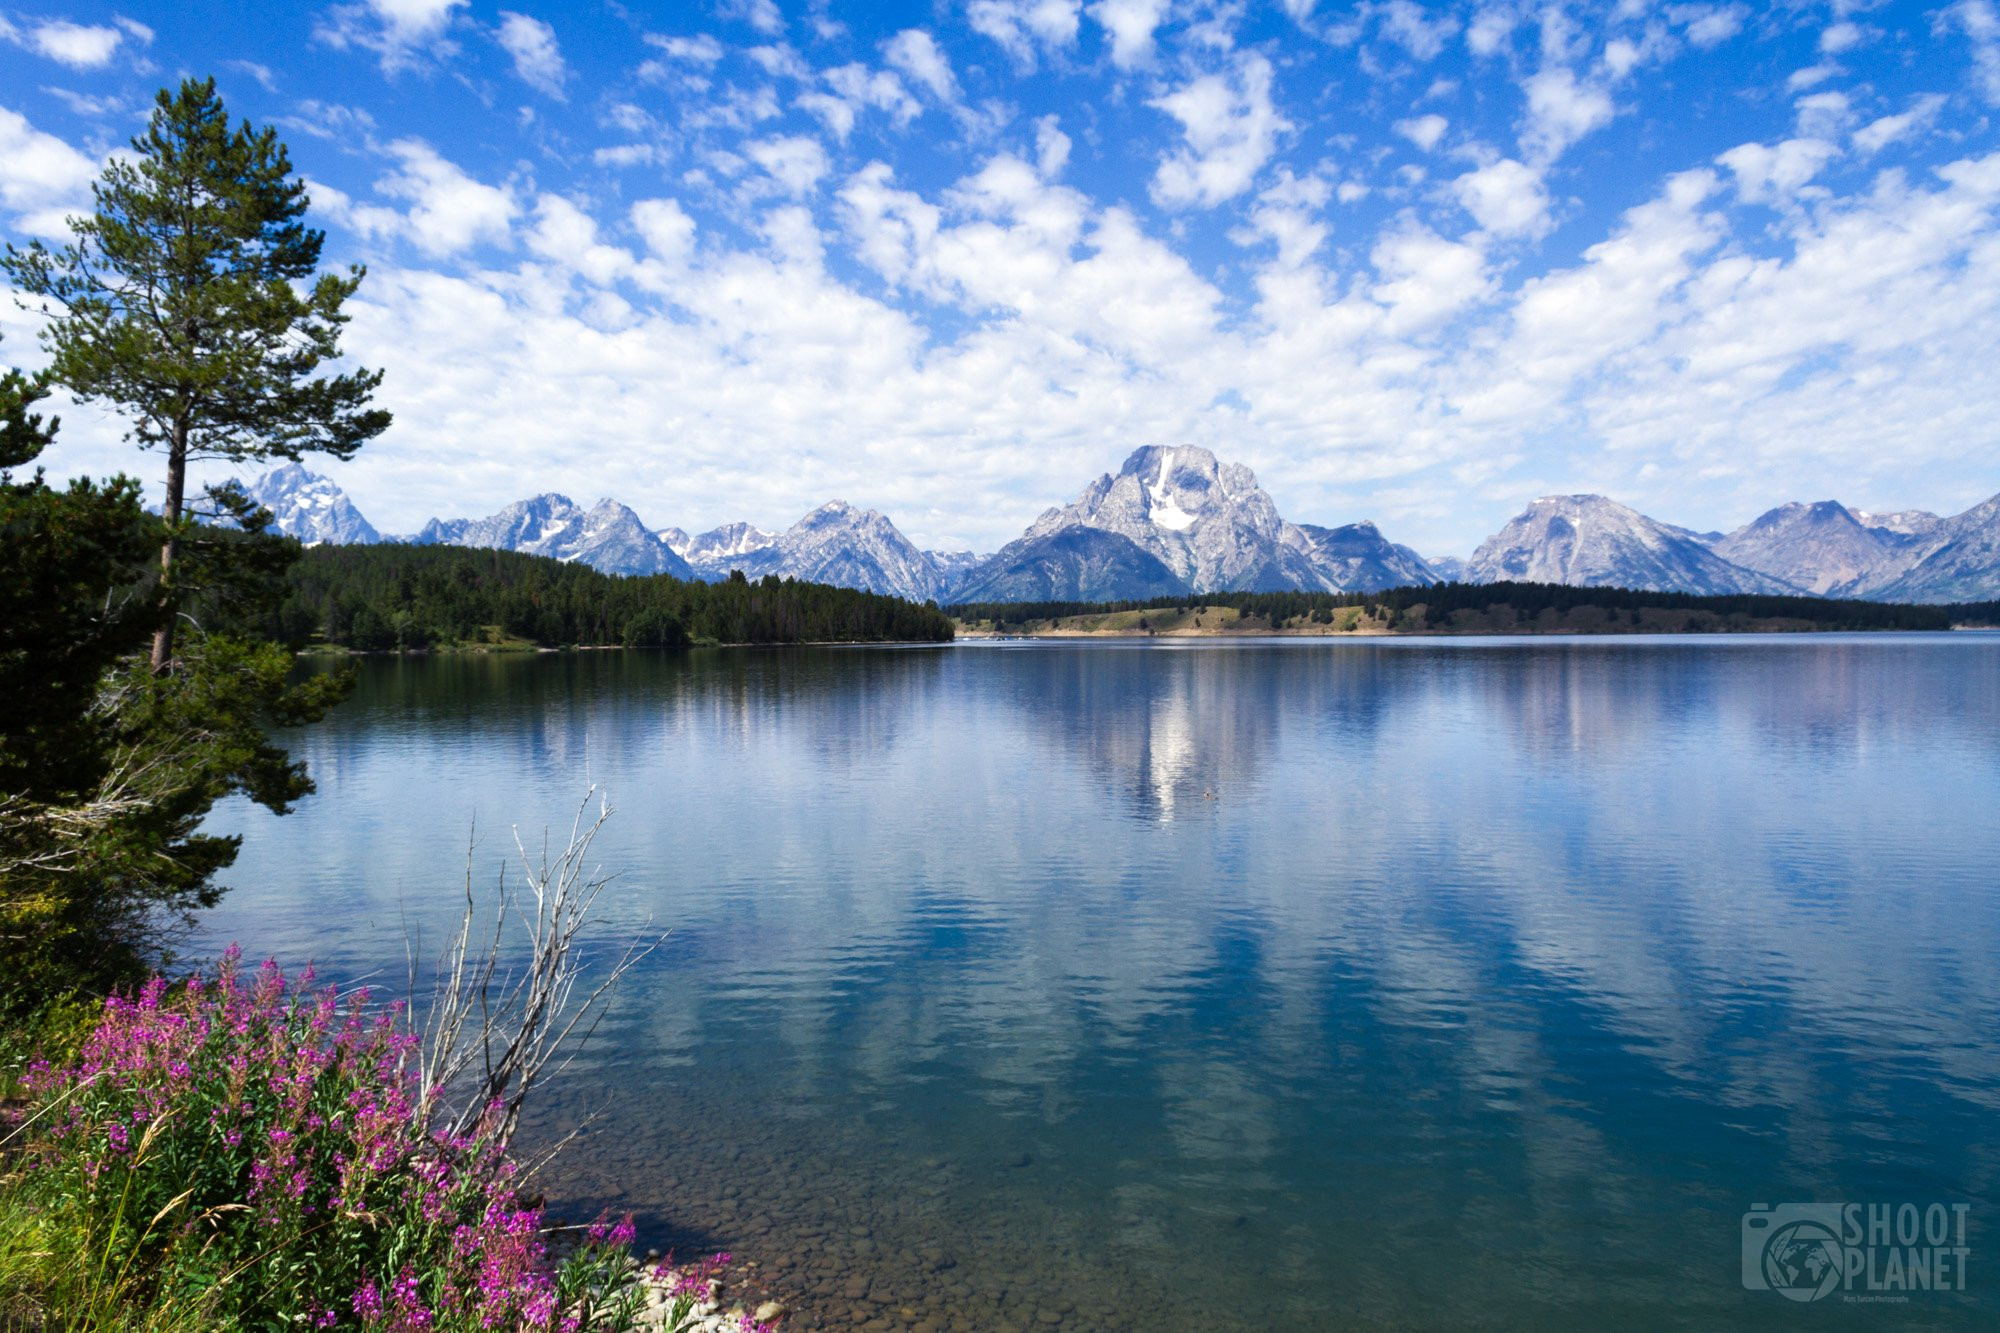 Grand Teton mountains lake reflection, Wyoming USA